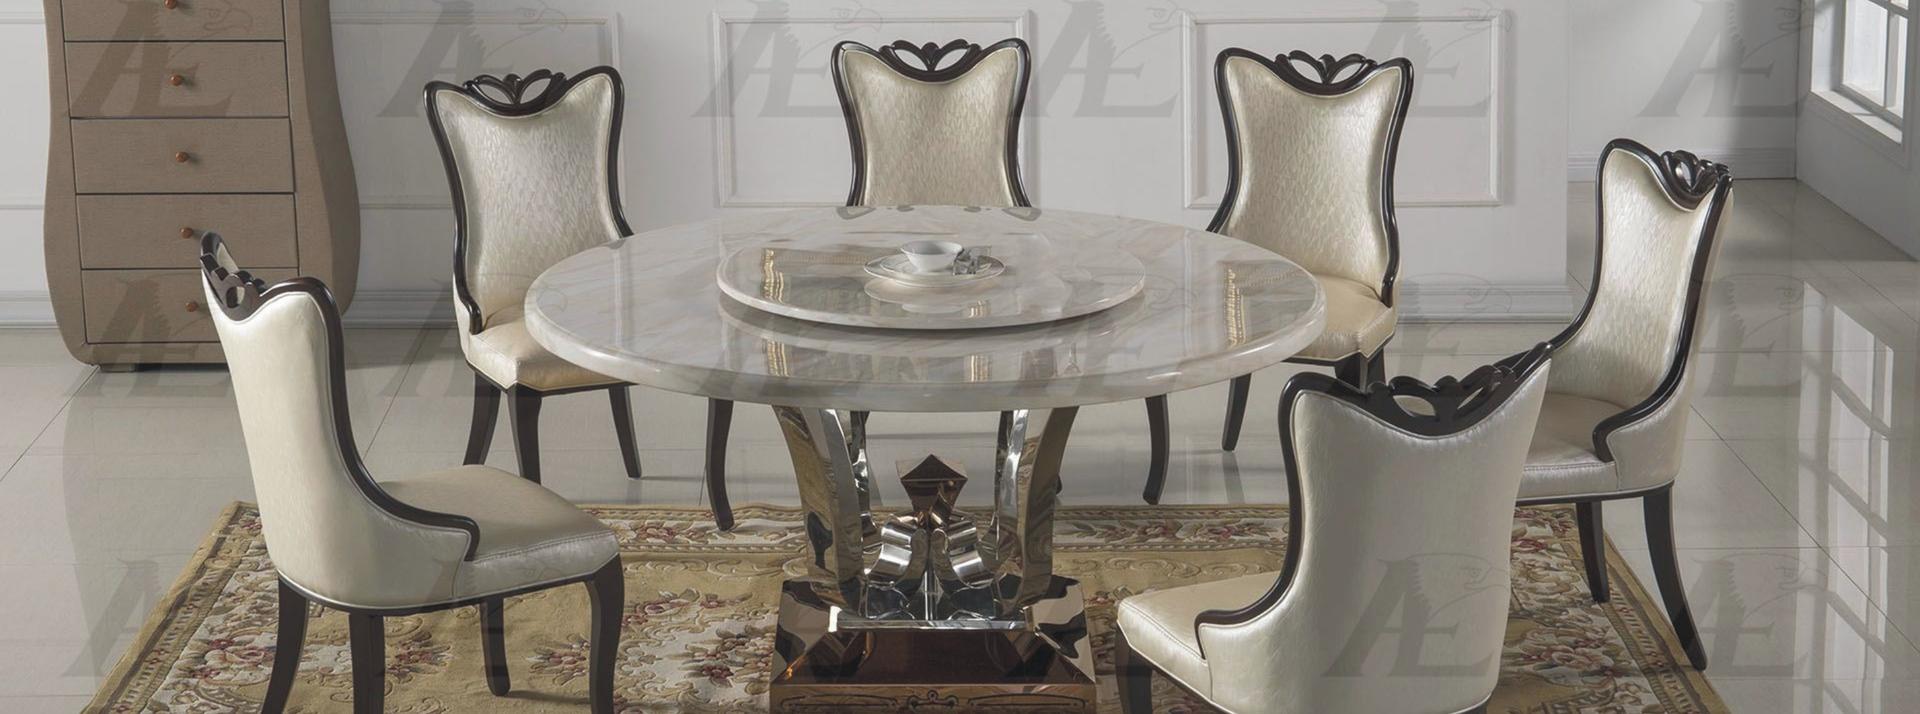 modern furniture fashion home interiors